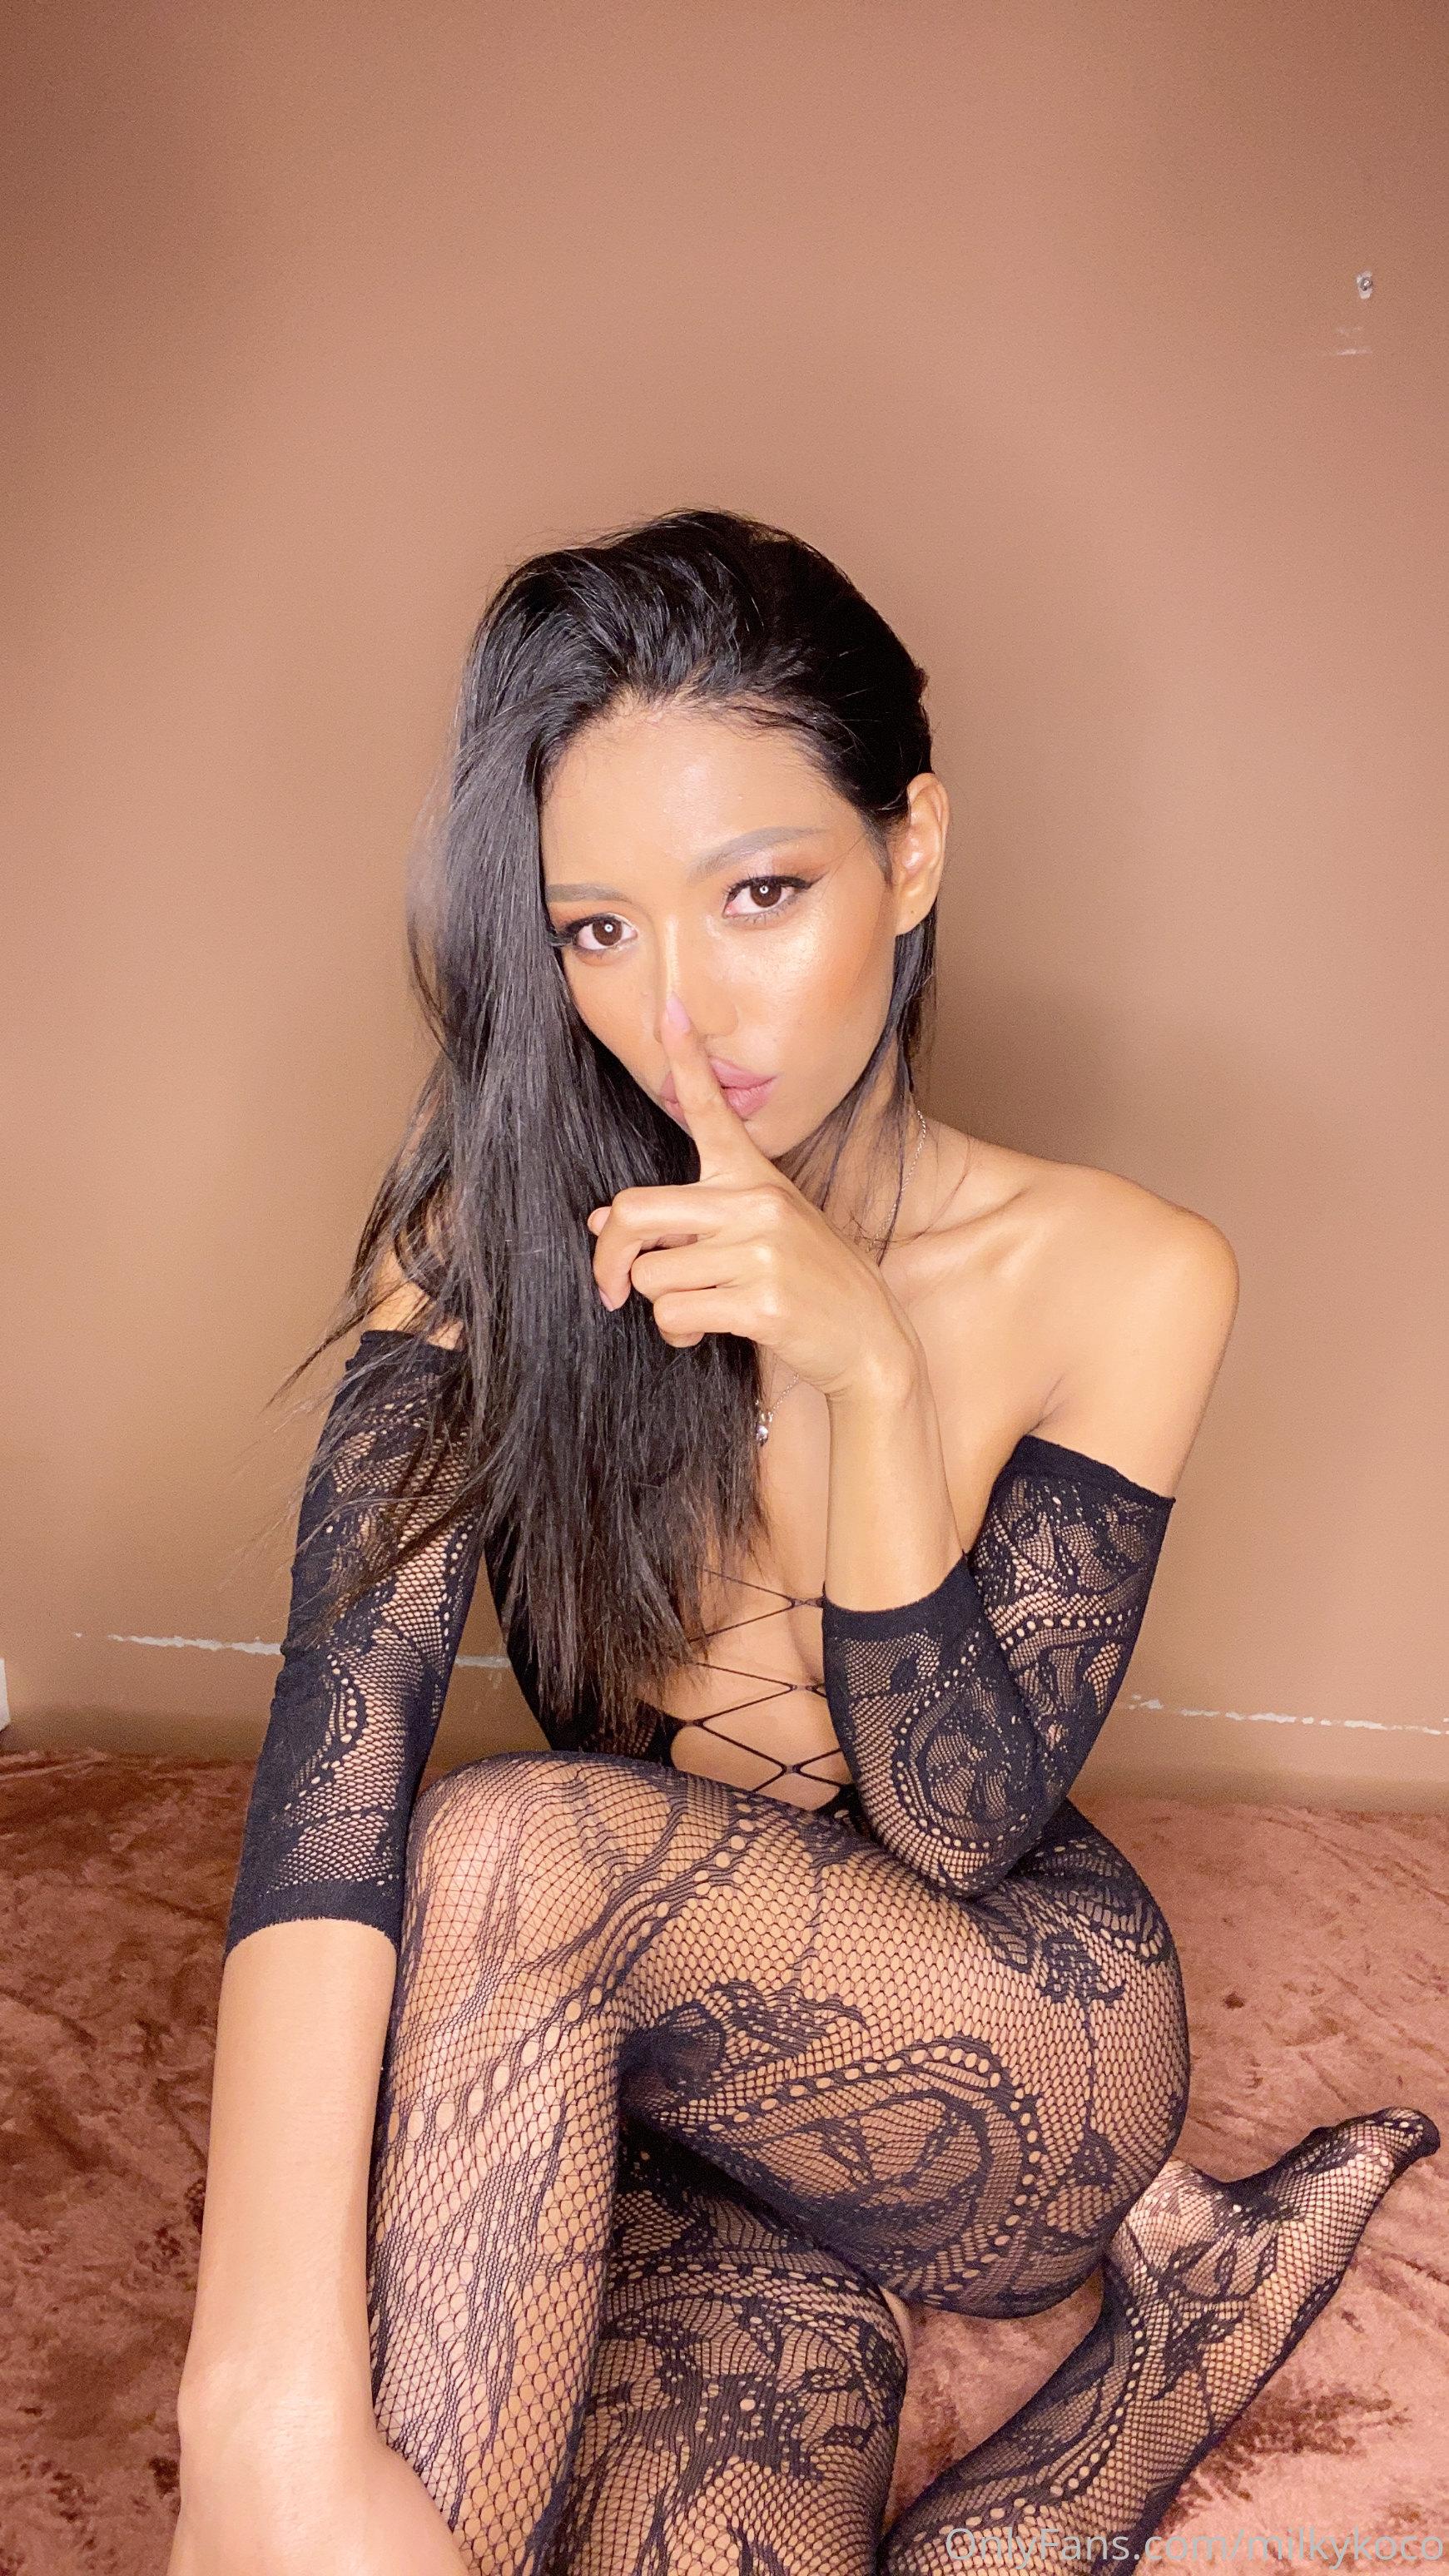 Koko Mylk Bangkok Model Leaked Onlyfans 0114